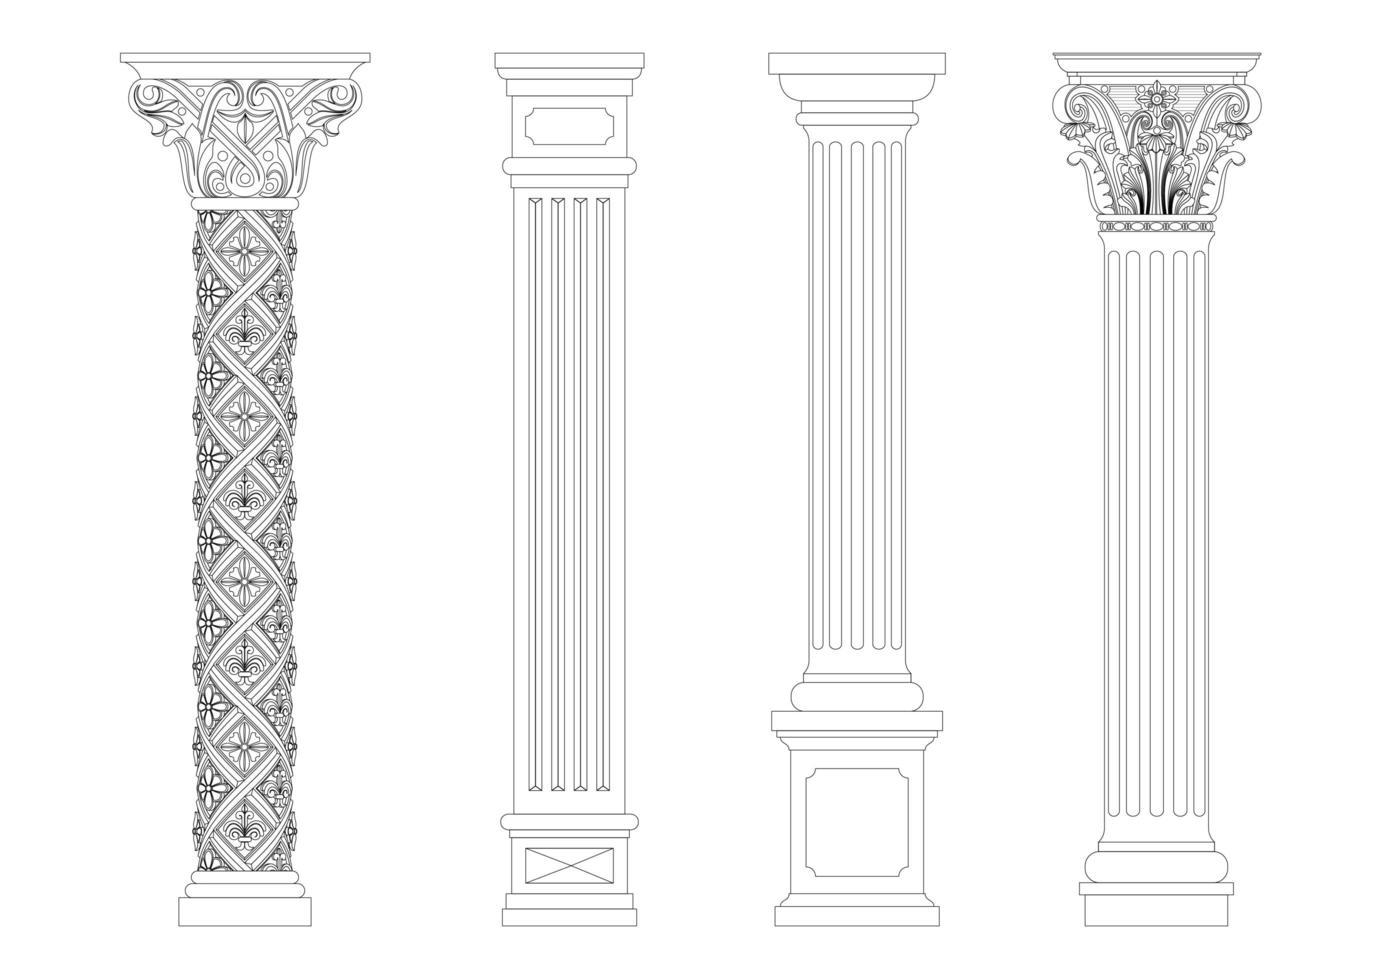 klassische Säulen im Umrissstil vektor